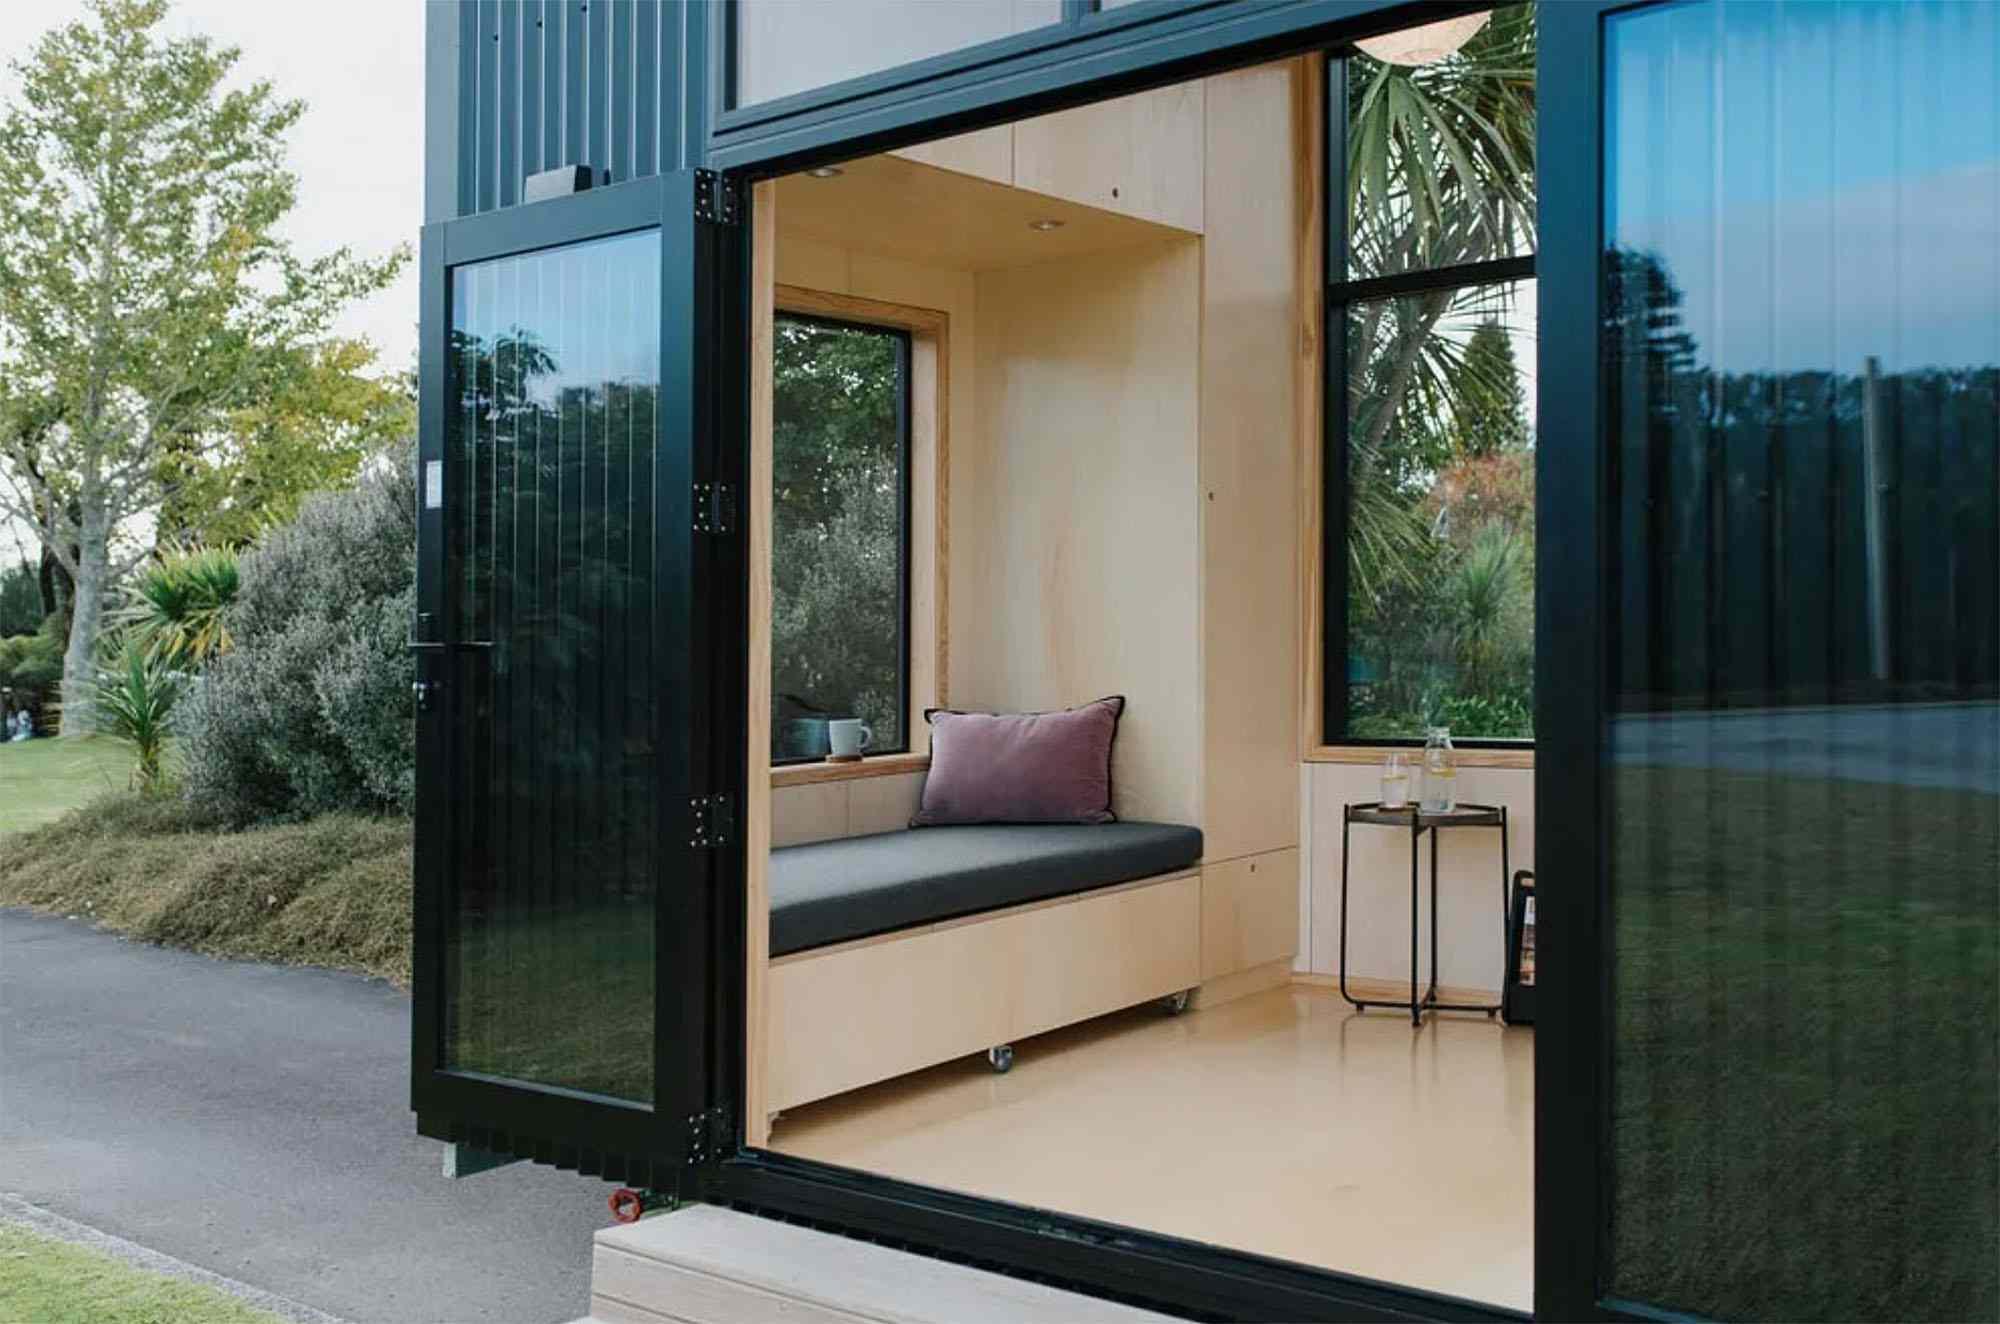 Ohariu tiny house by First Light Studio and Build Tiny entry